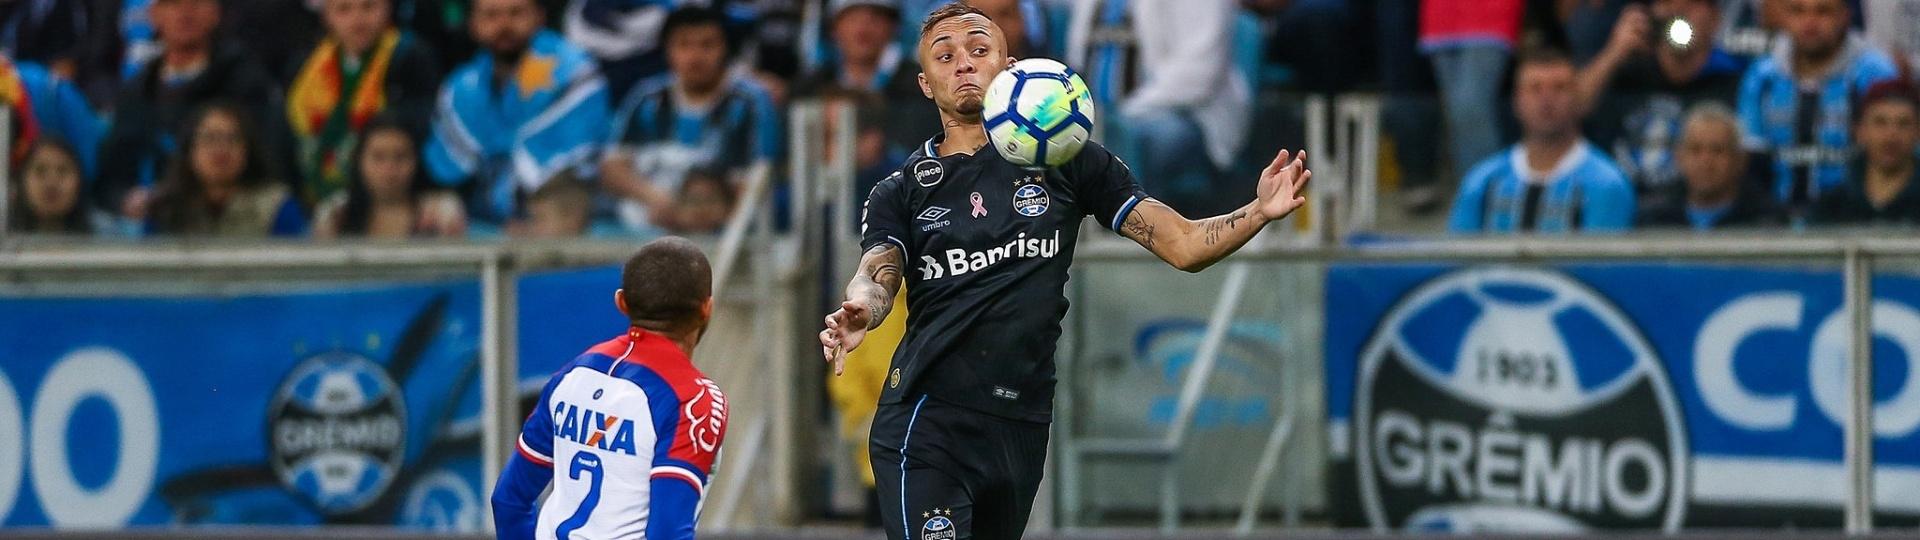 Everton sente coxa direita e sai antes do intervalo de Grêmio x Bahia